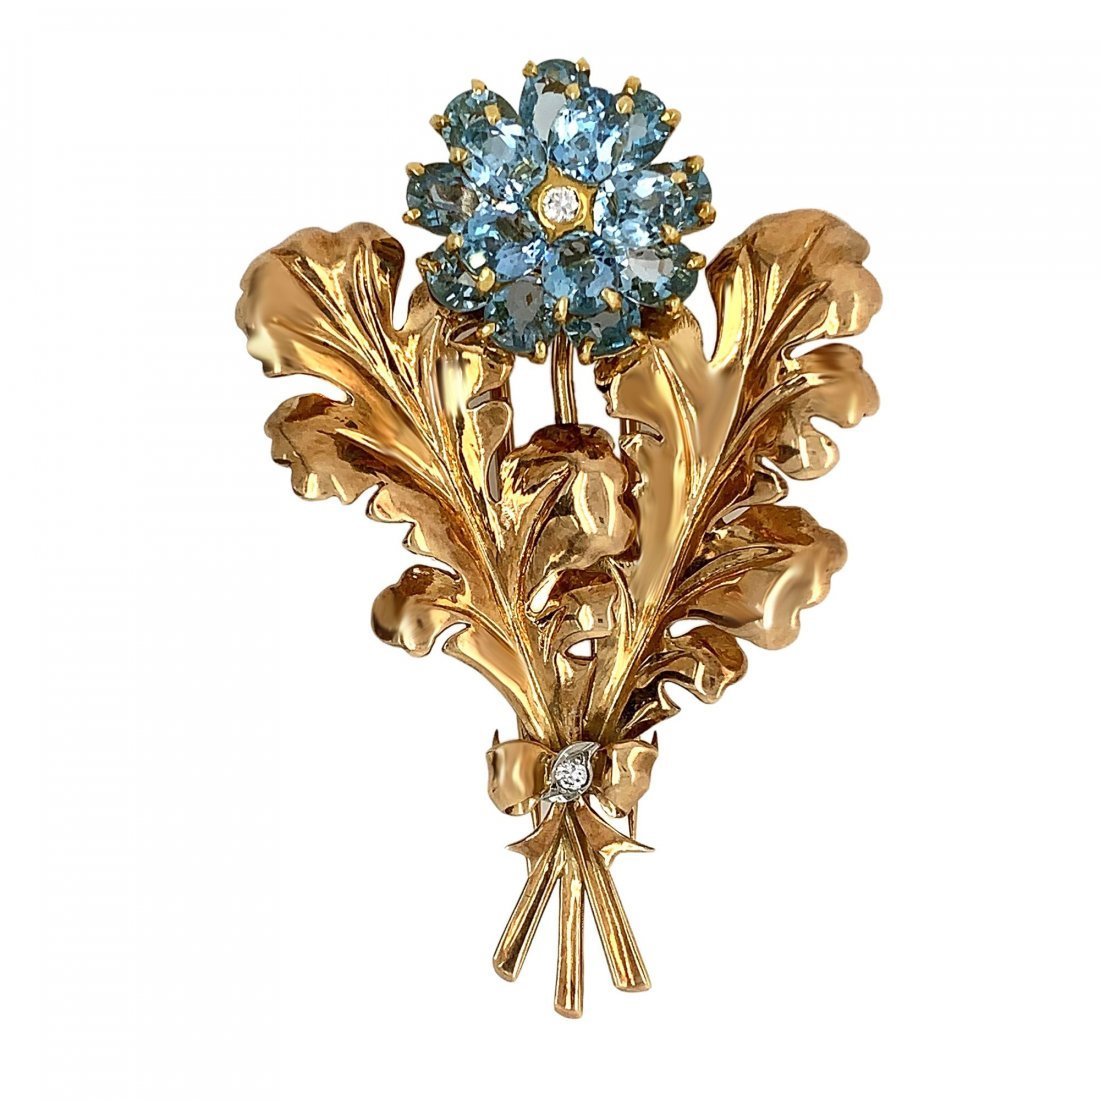 Cartier 14K Yellow Gold Aquamarine Diamond Leaf Brooch